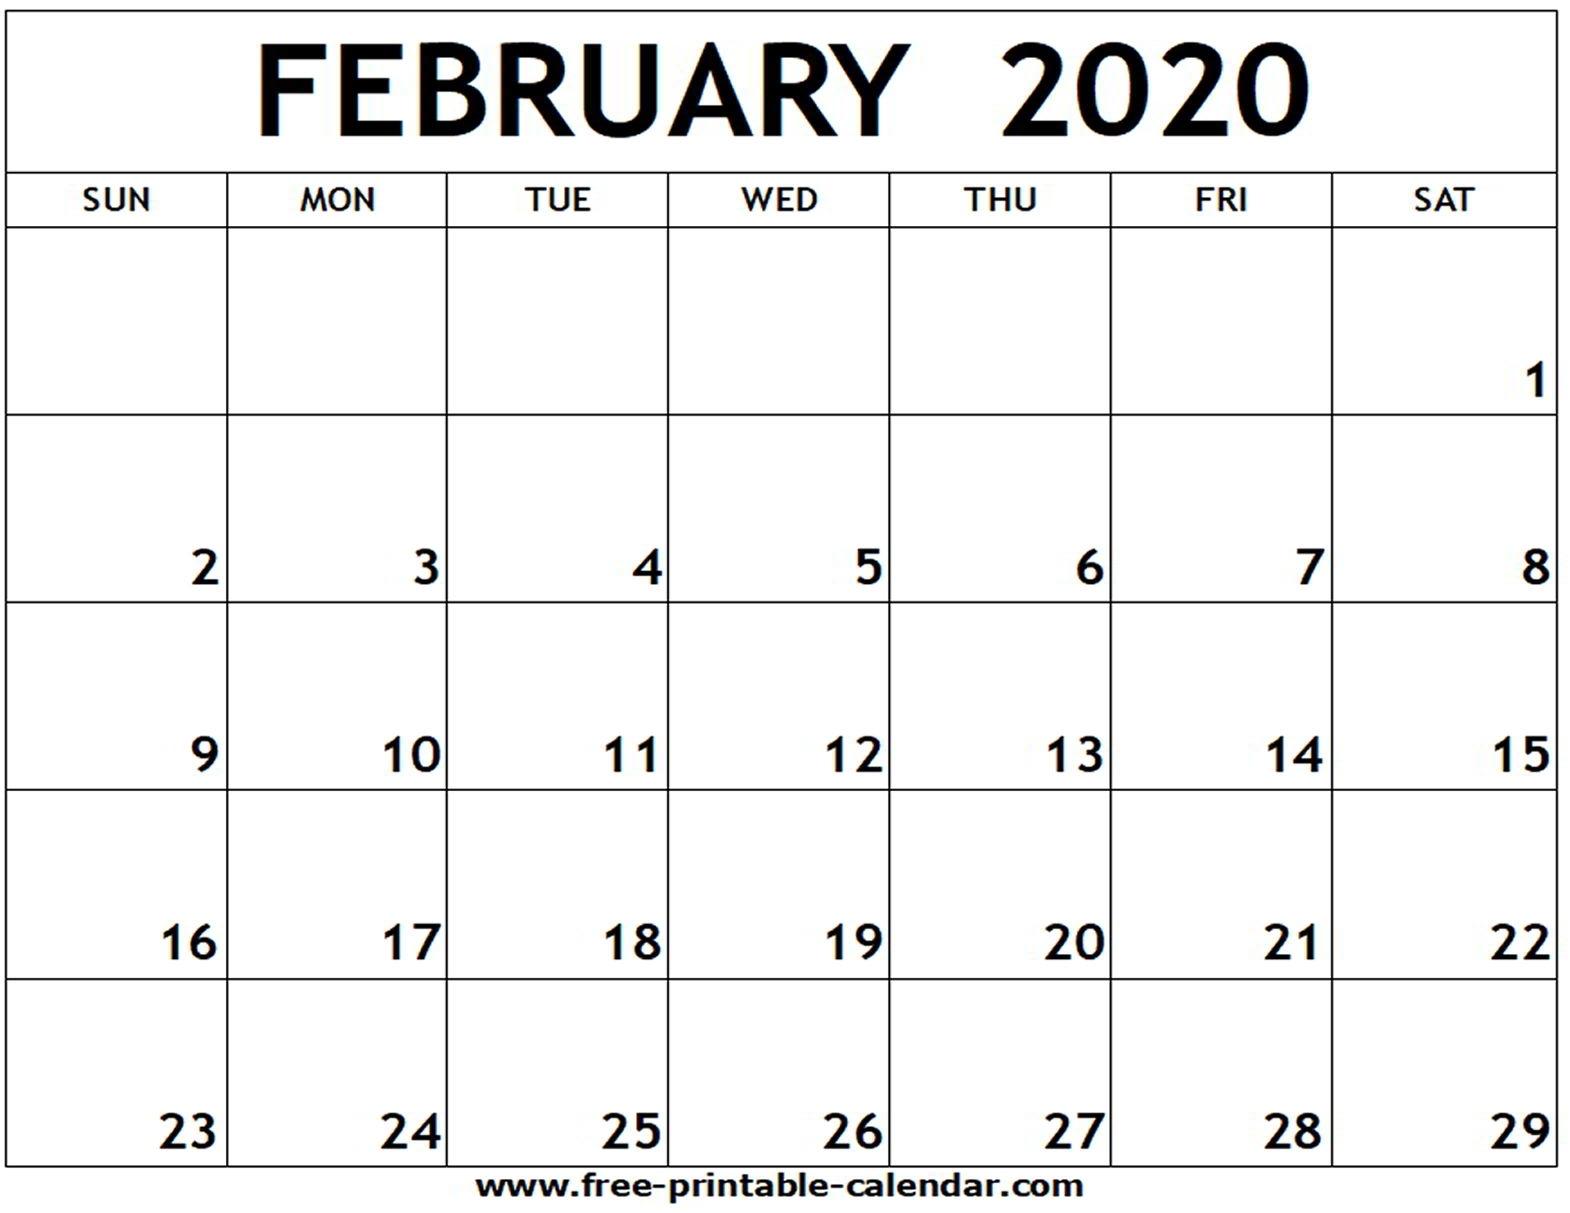 February 2020 Printable Calendar - Free-Printable-Calendar within Printable 2020 Calendar I Can Edit